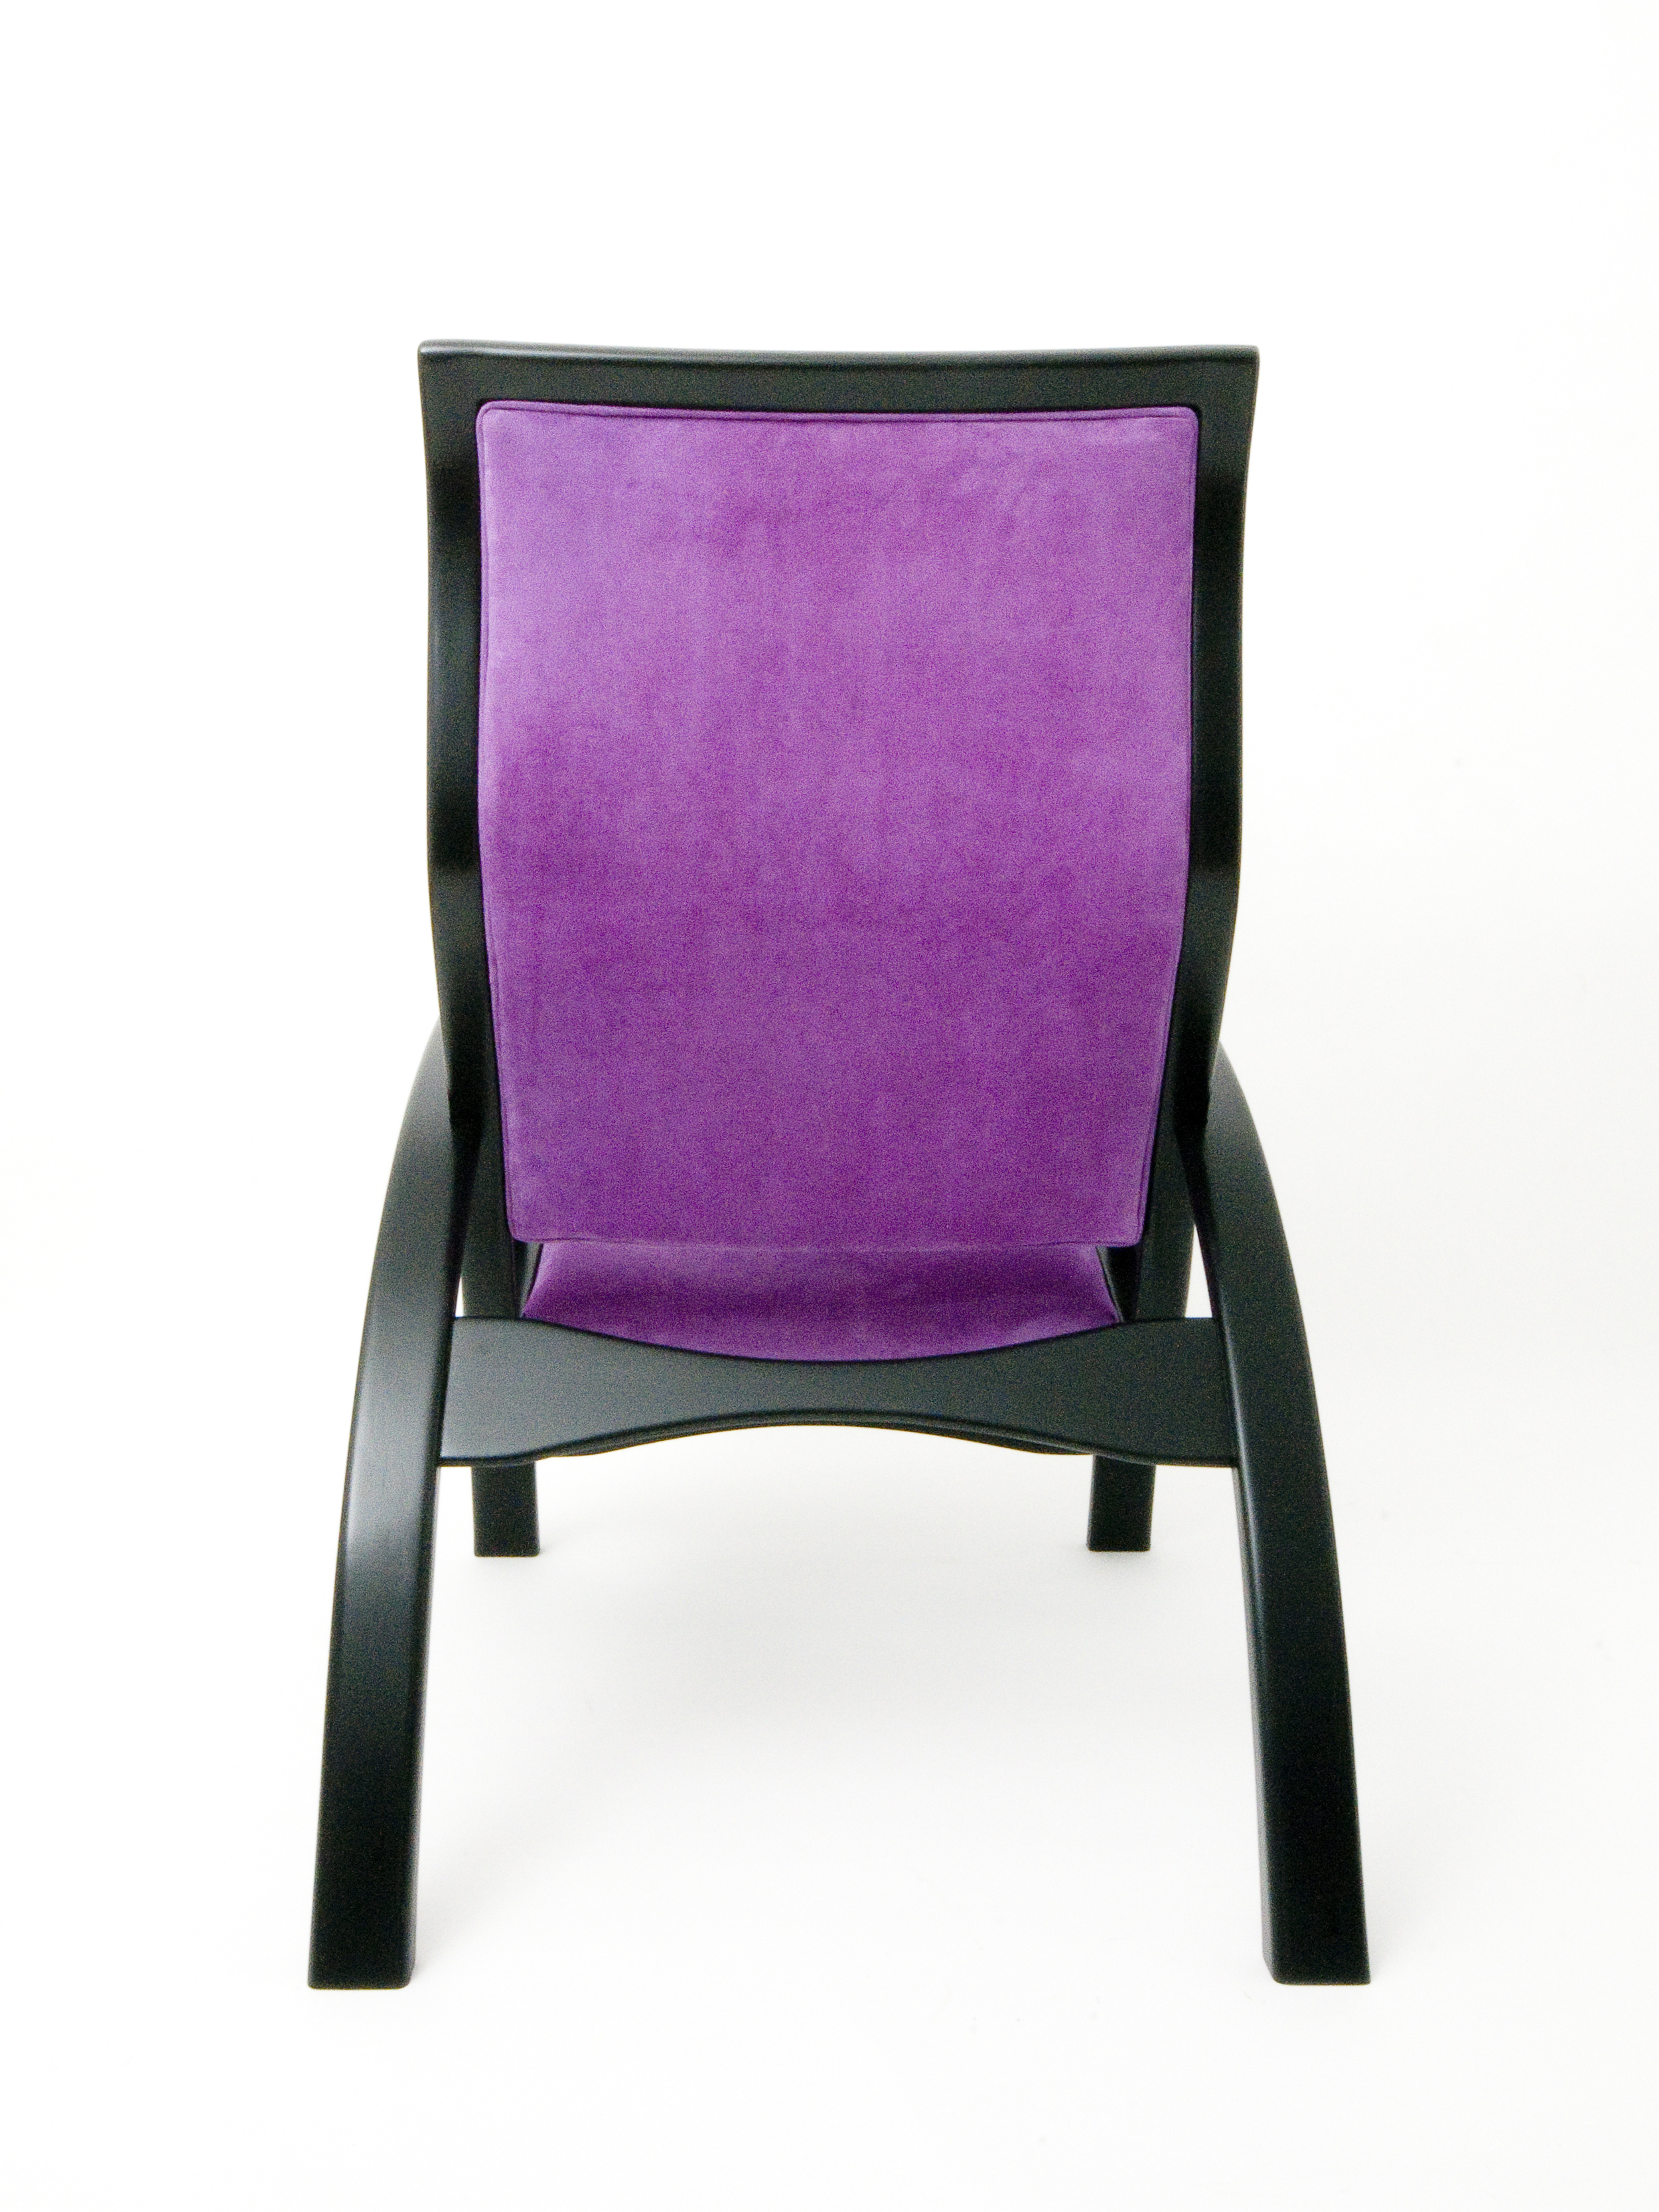 Crown royal chair1.jpg